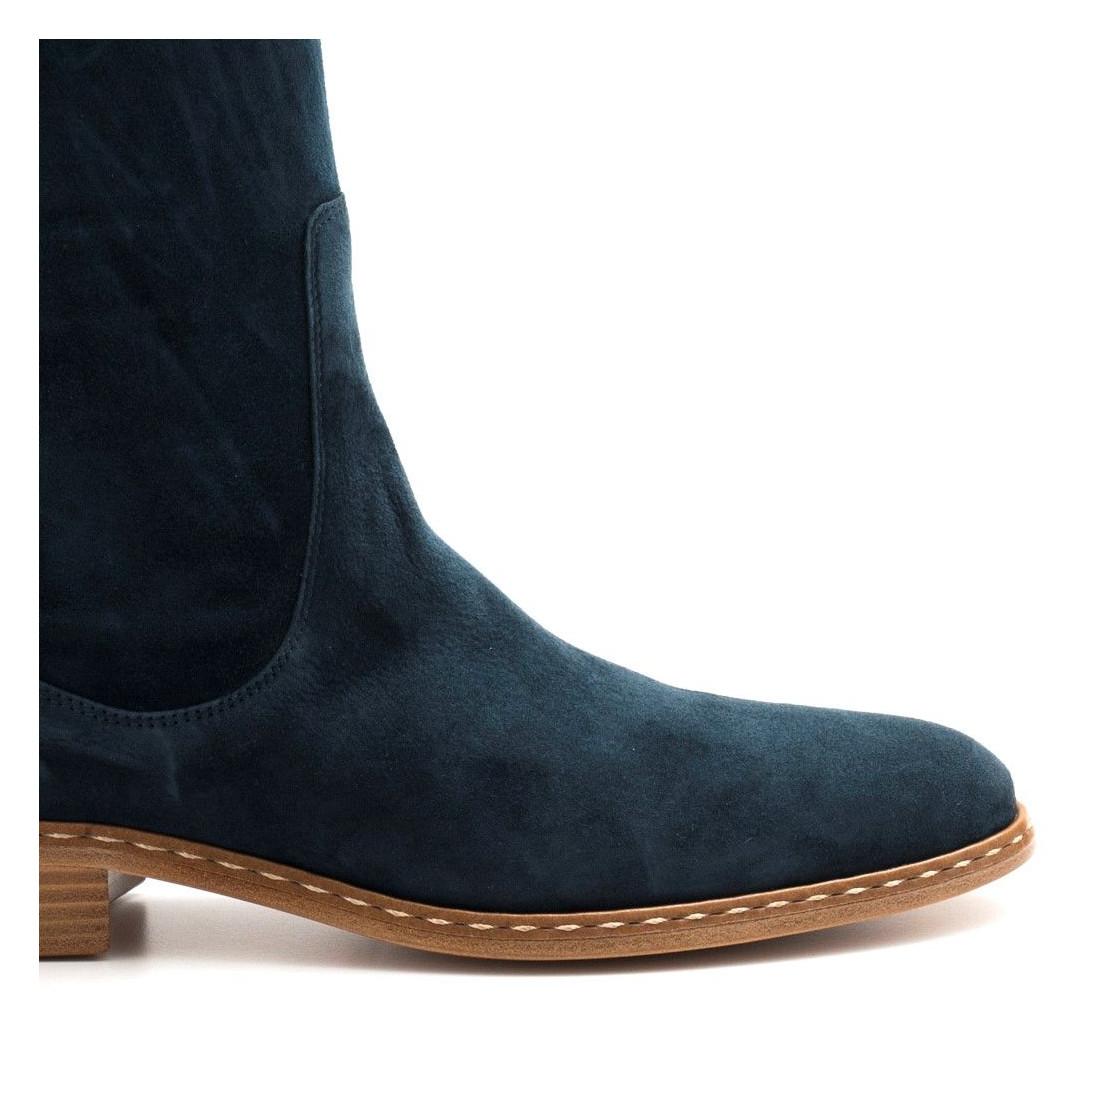 stivali donna lorenzo masiero b4636234 velour blu 4536